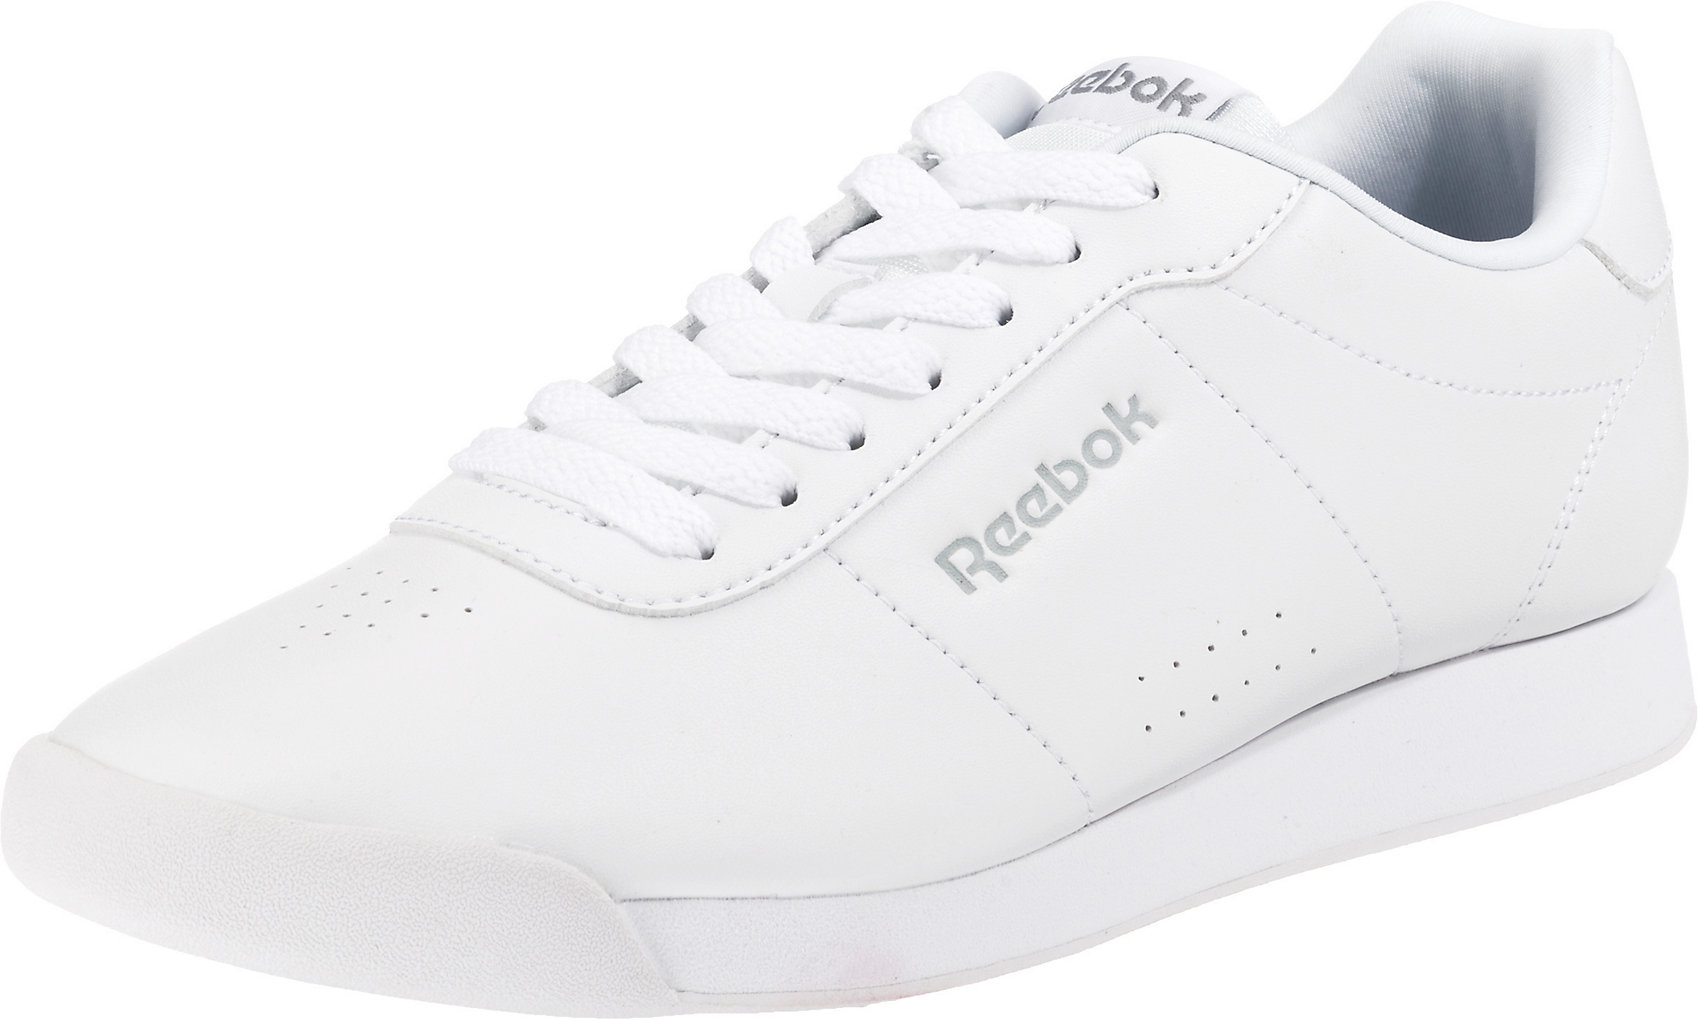 Neu Reebok ROYAL CHARM Sneakers Low 7408160 für Damen weiß